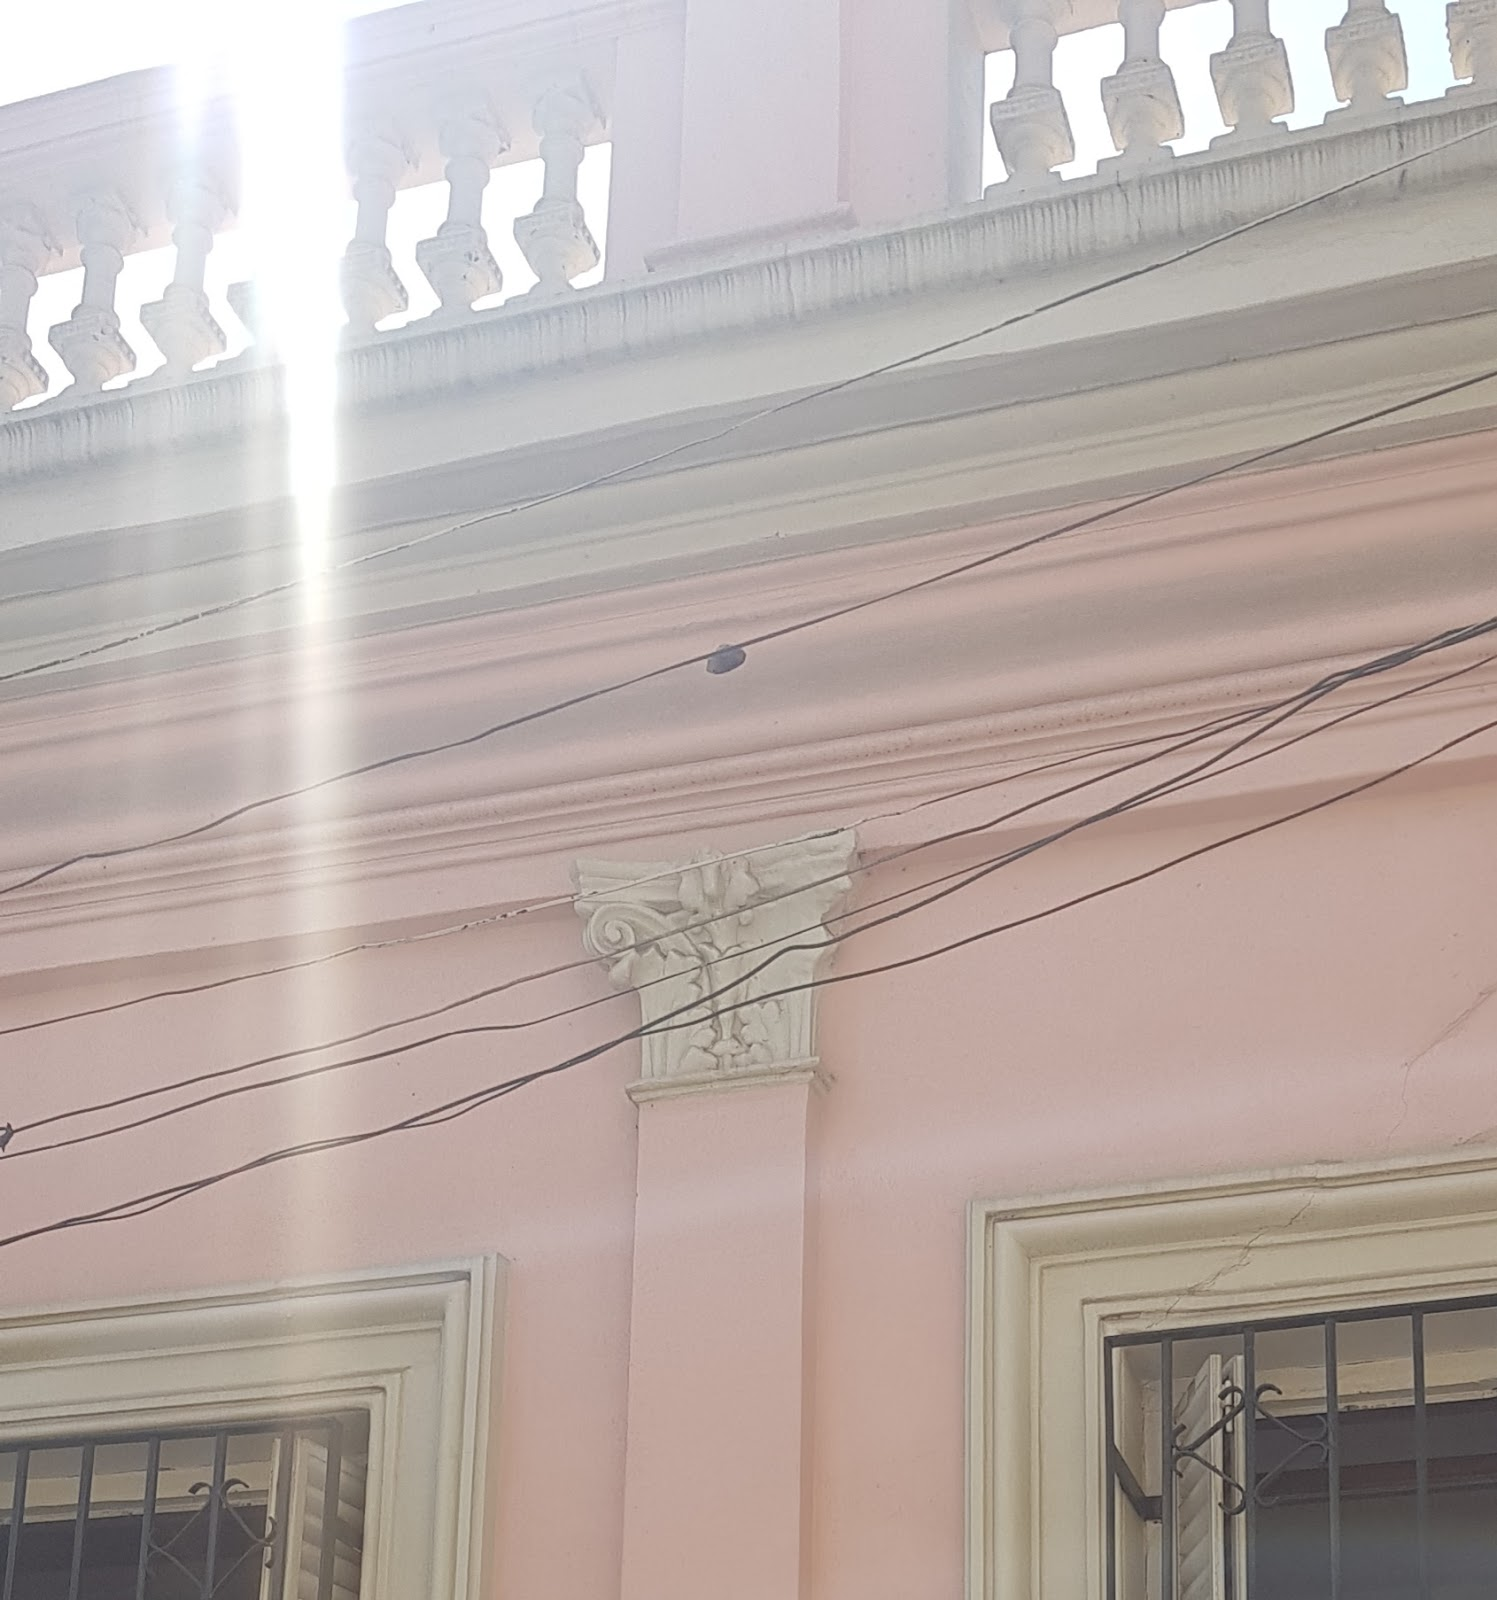 Ventilacion arriba casa chorizo